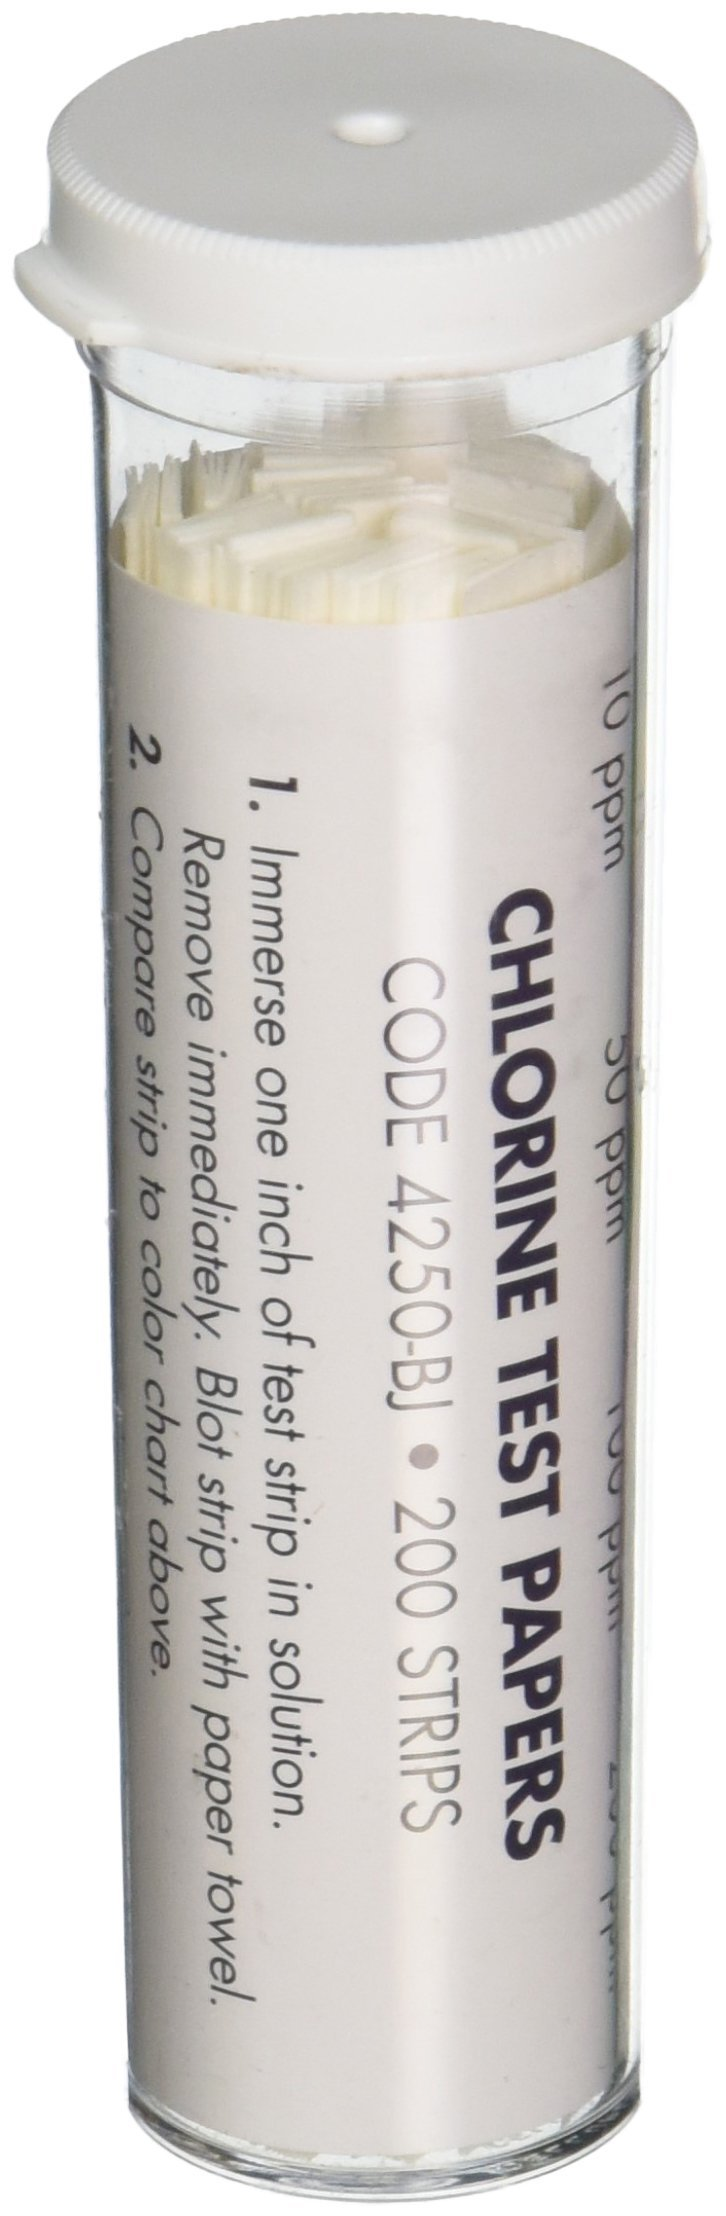 LaMotte 4250-BJ Chlorine Test Strips, Sanitizer Strength